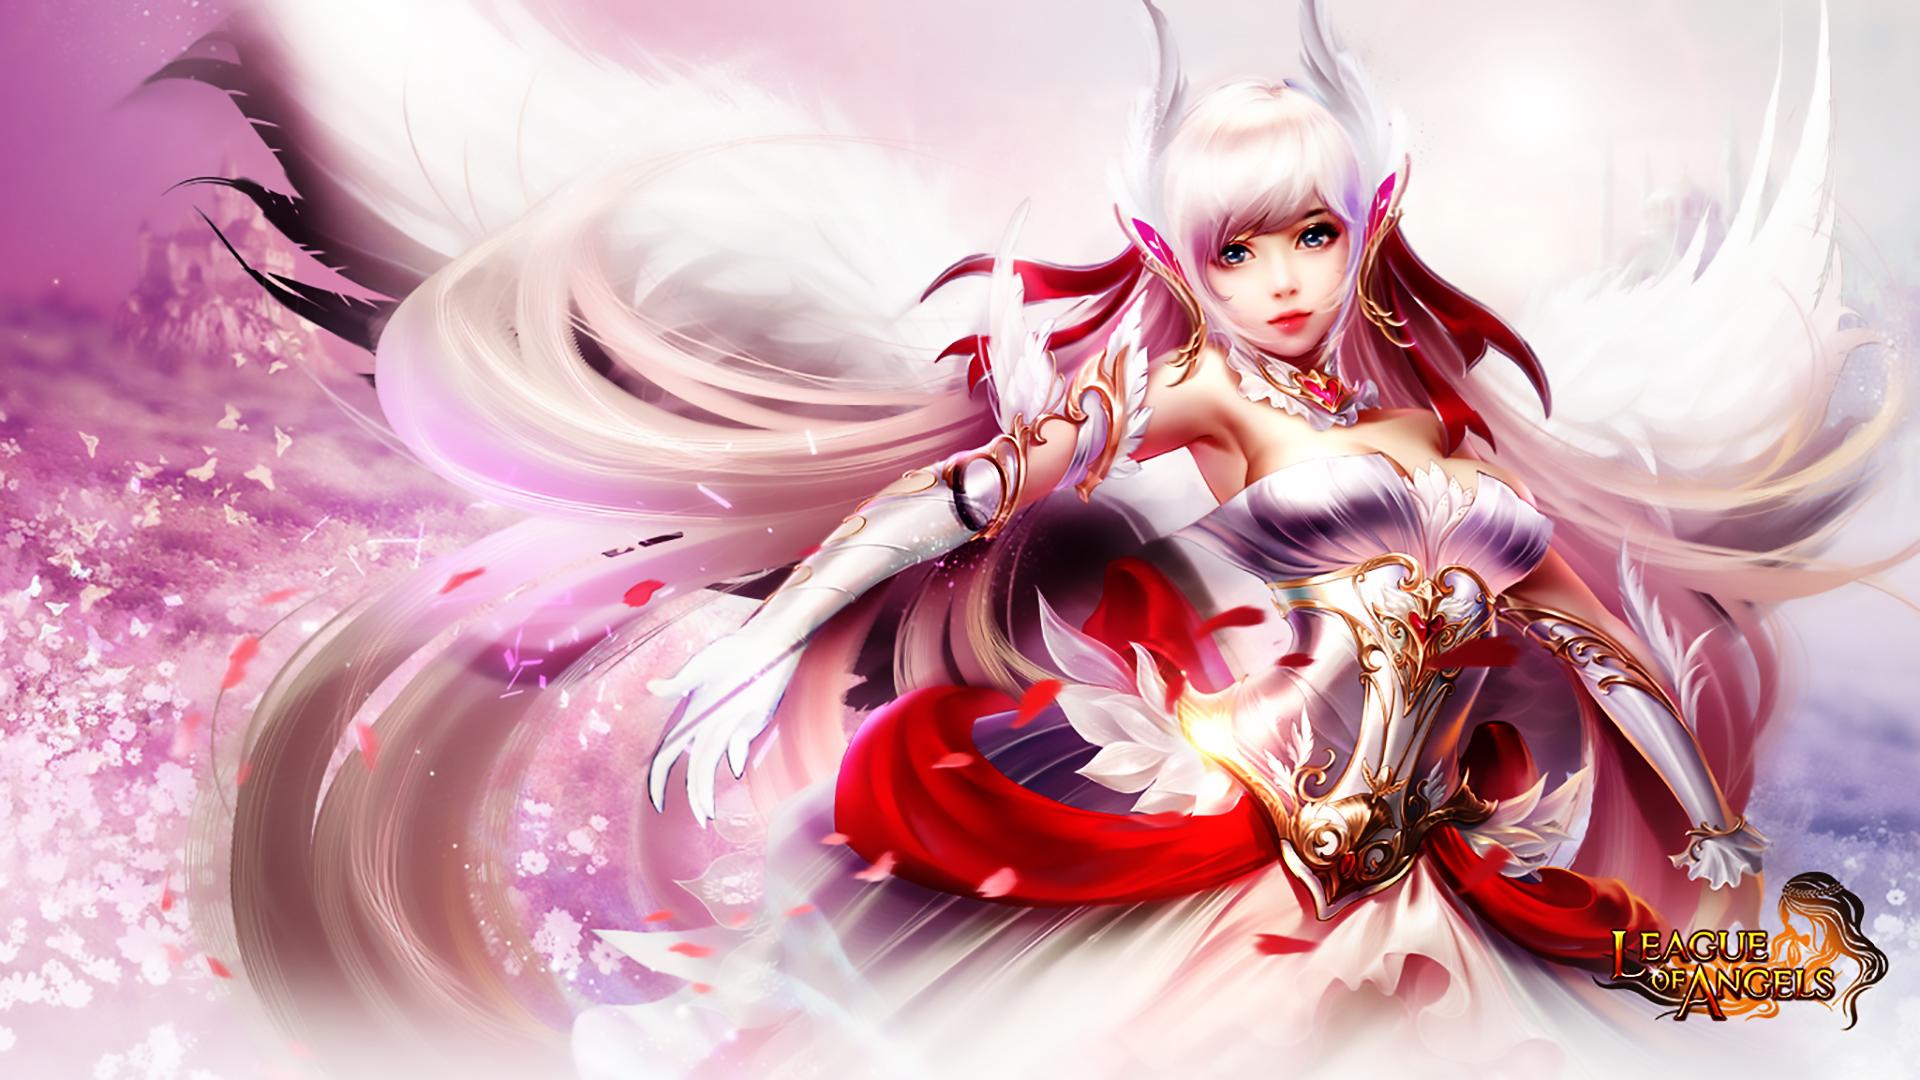 League Of Angels Wallpaper 024 Aphrodite